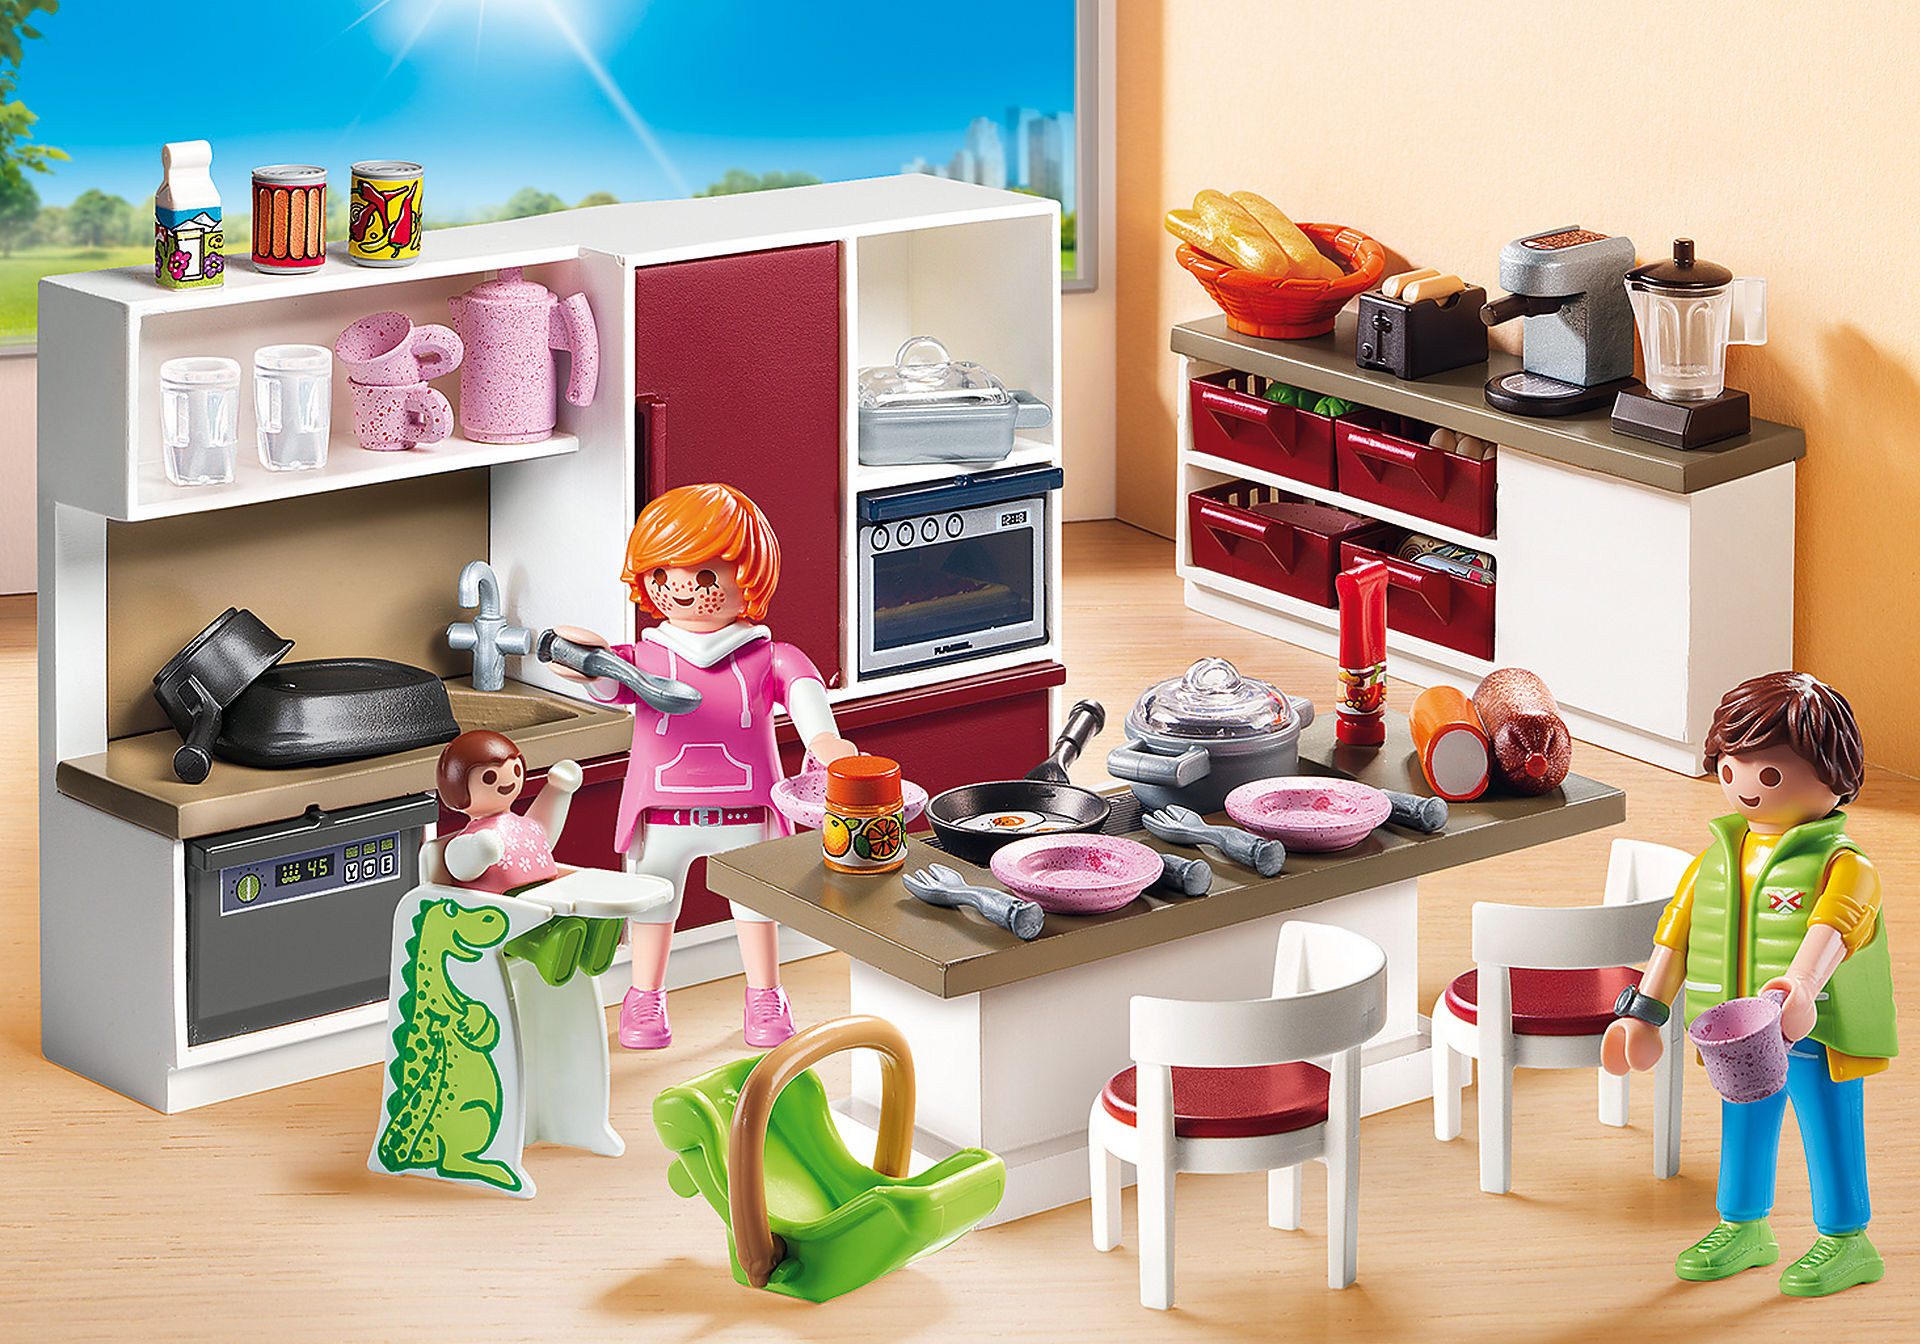 Accessoires Pour Cuisine Aménagée cuisine aménagée - 9269 - playmobil® france